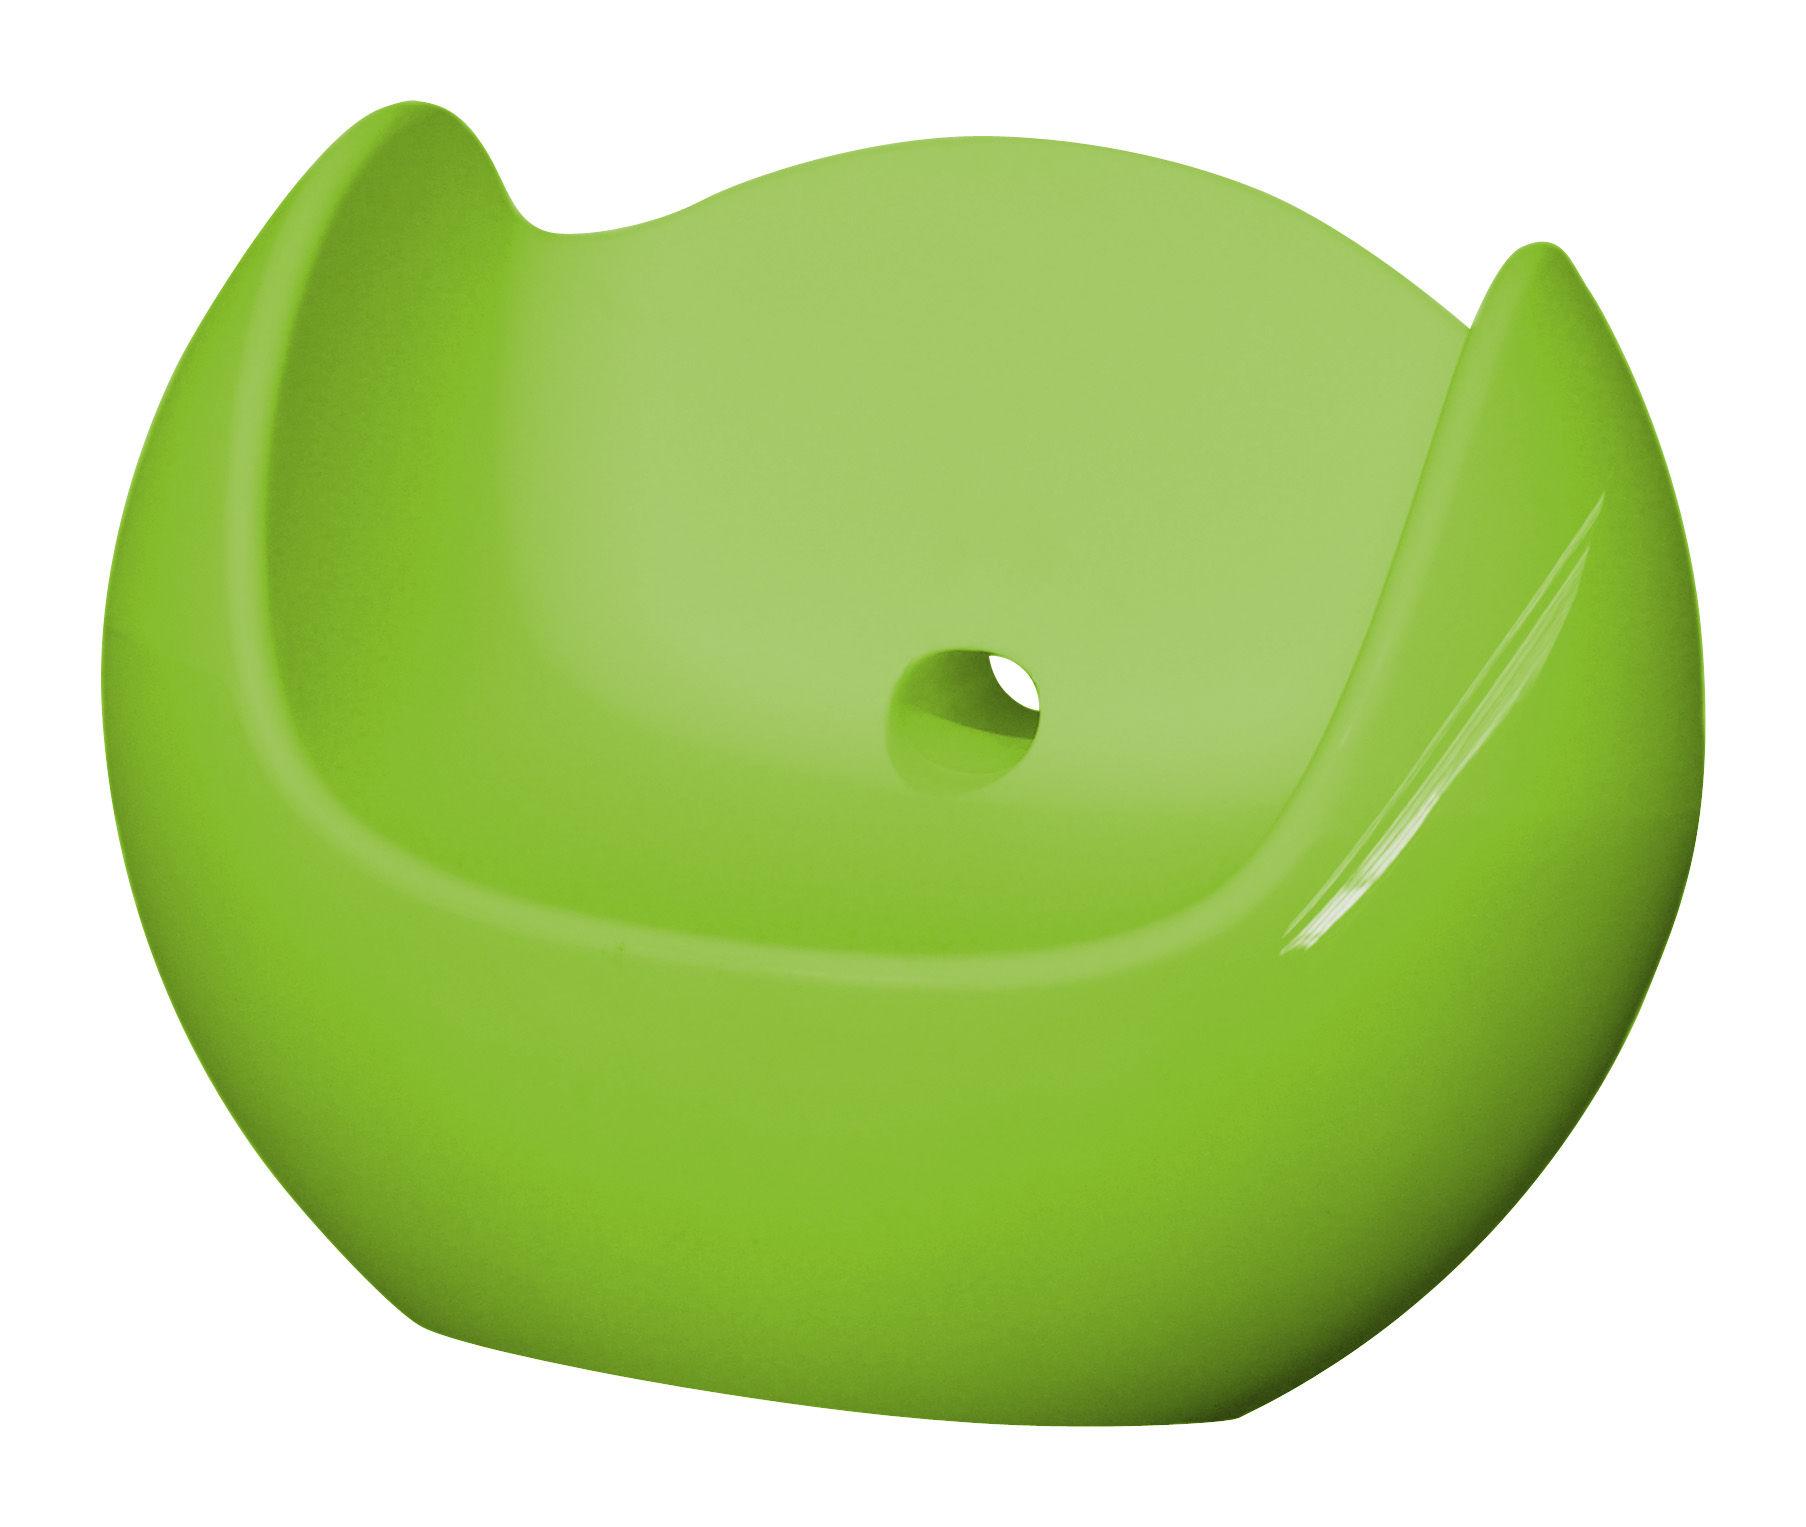 Möbel - Möbel für Teens - Blos Schaukelstuhl lackiert - Slide - Grün lackiert - lackiertes Polyäthylen